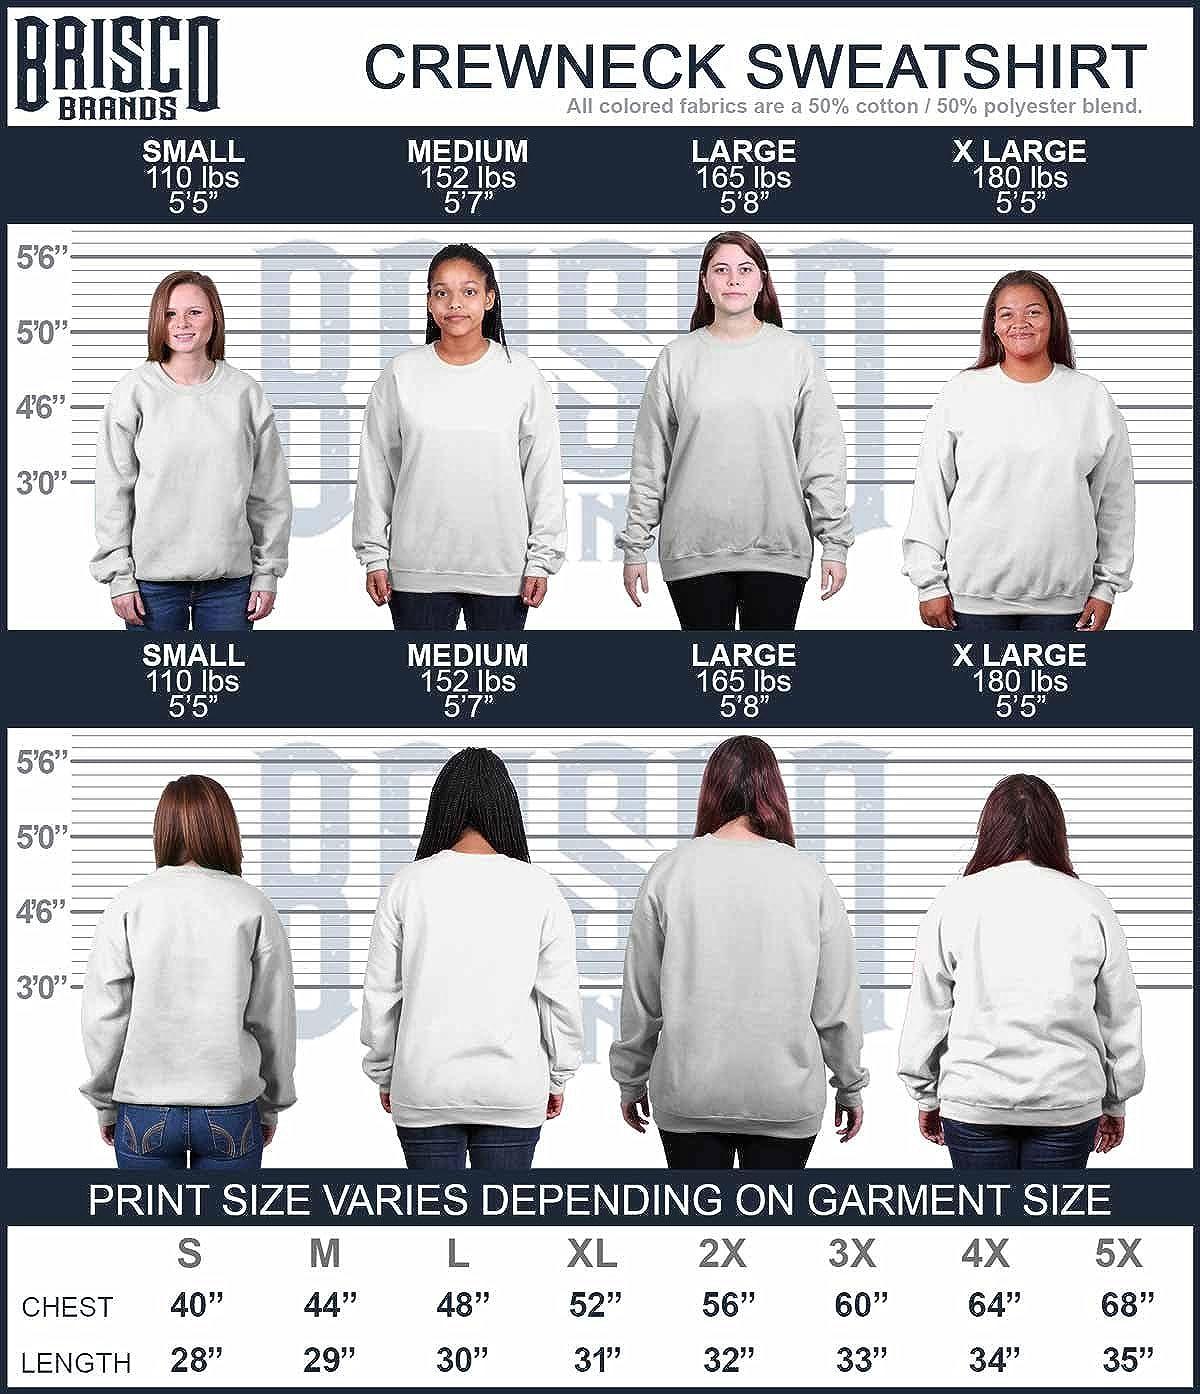 California Love Heart Pineapple USA Fashion Crewneck Sweatshirt